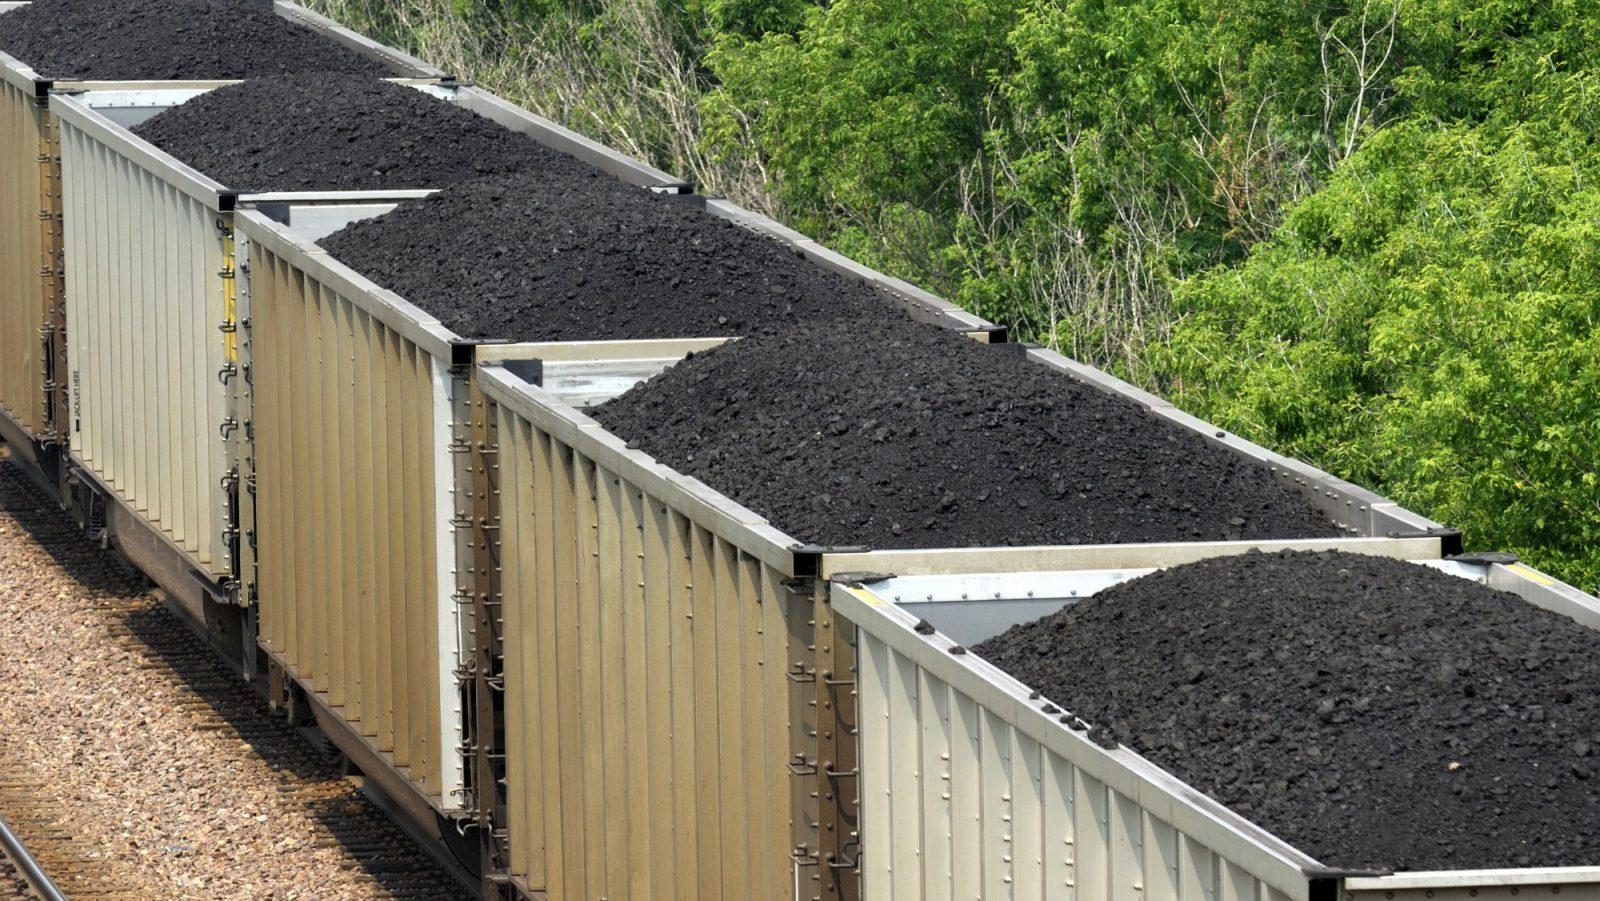 A coal train